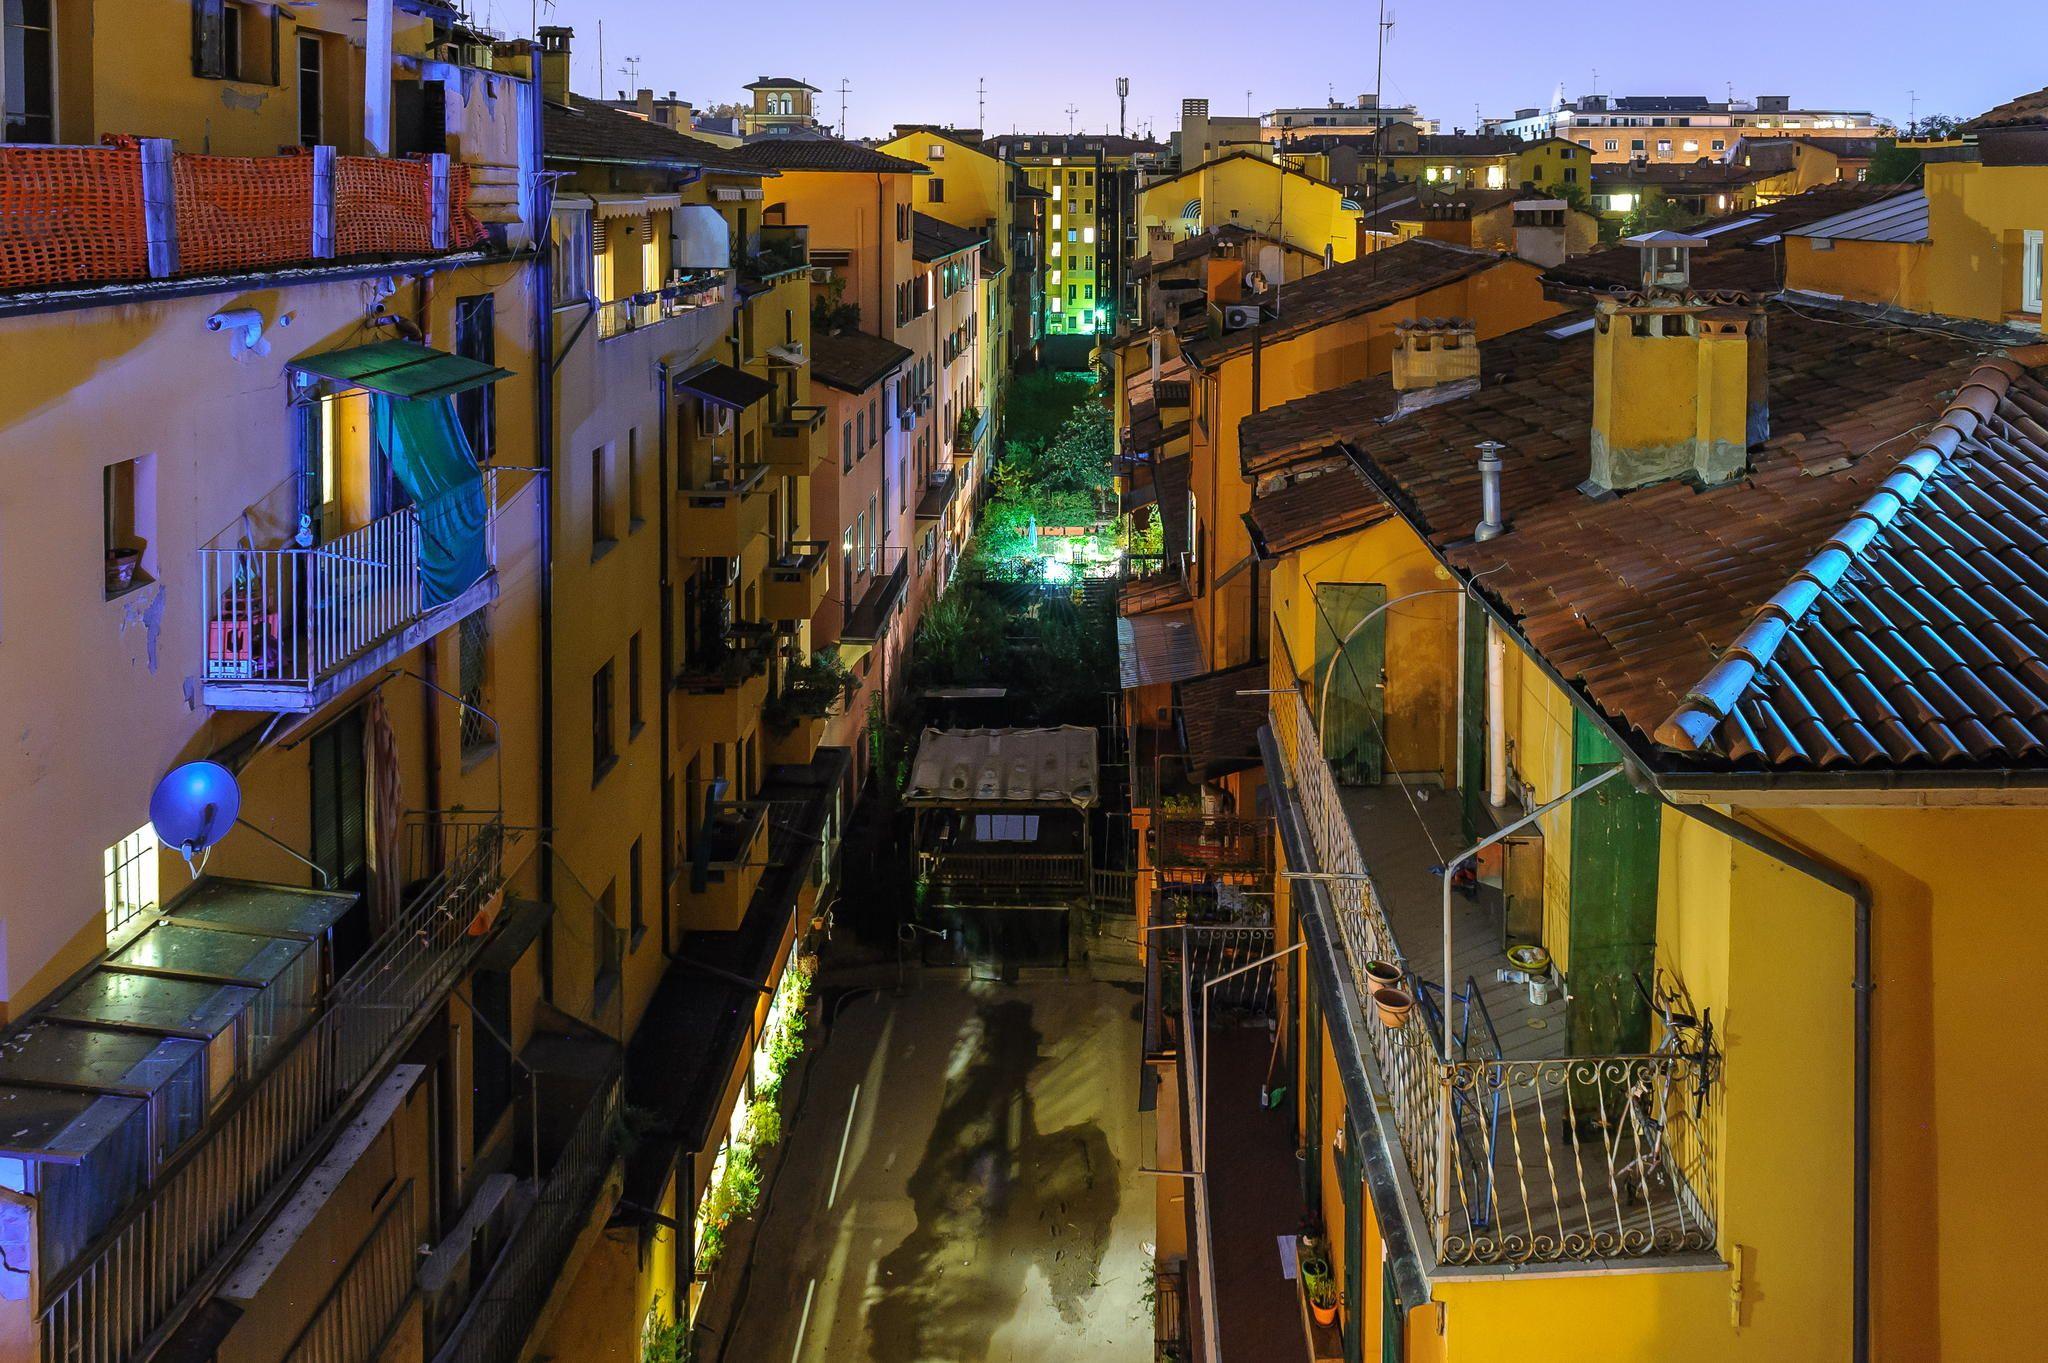 Bologna canal by damien tachoires on 500px bologne bologna italie italia italy pinterest - Bologna finestra sul canale ...